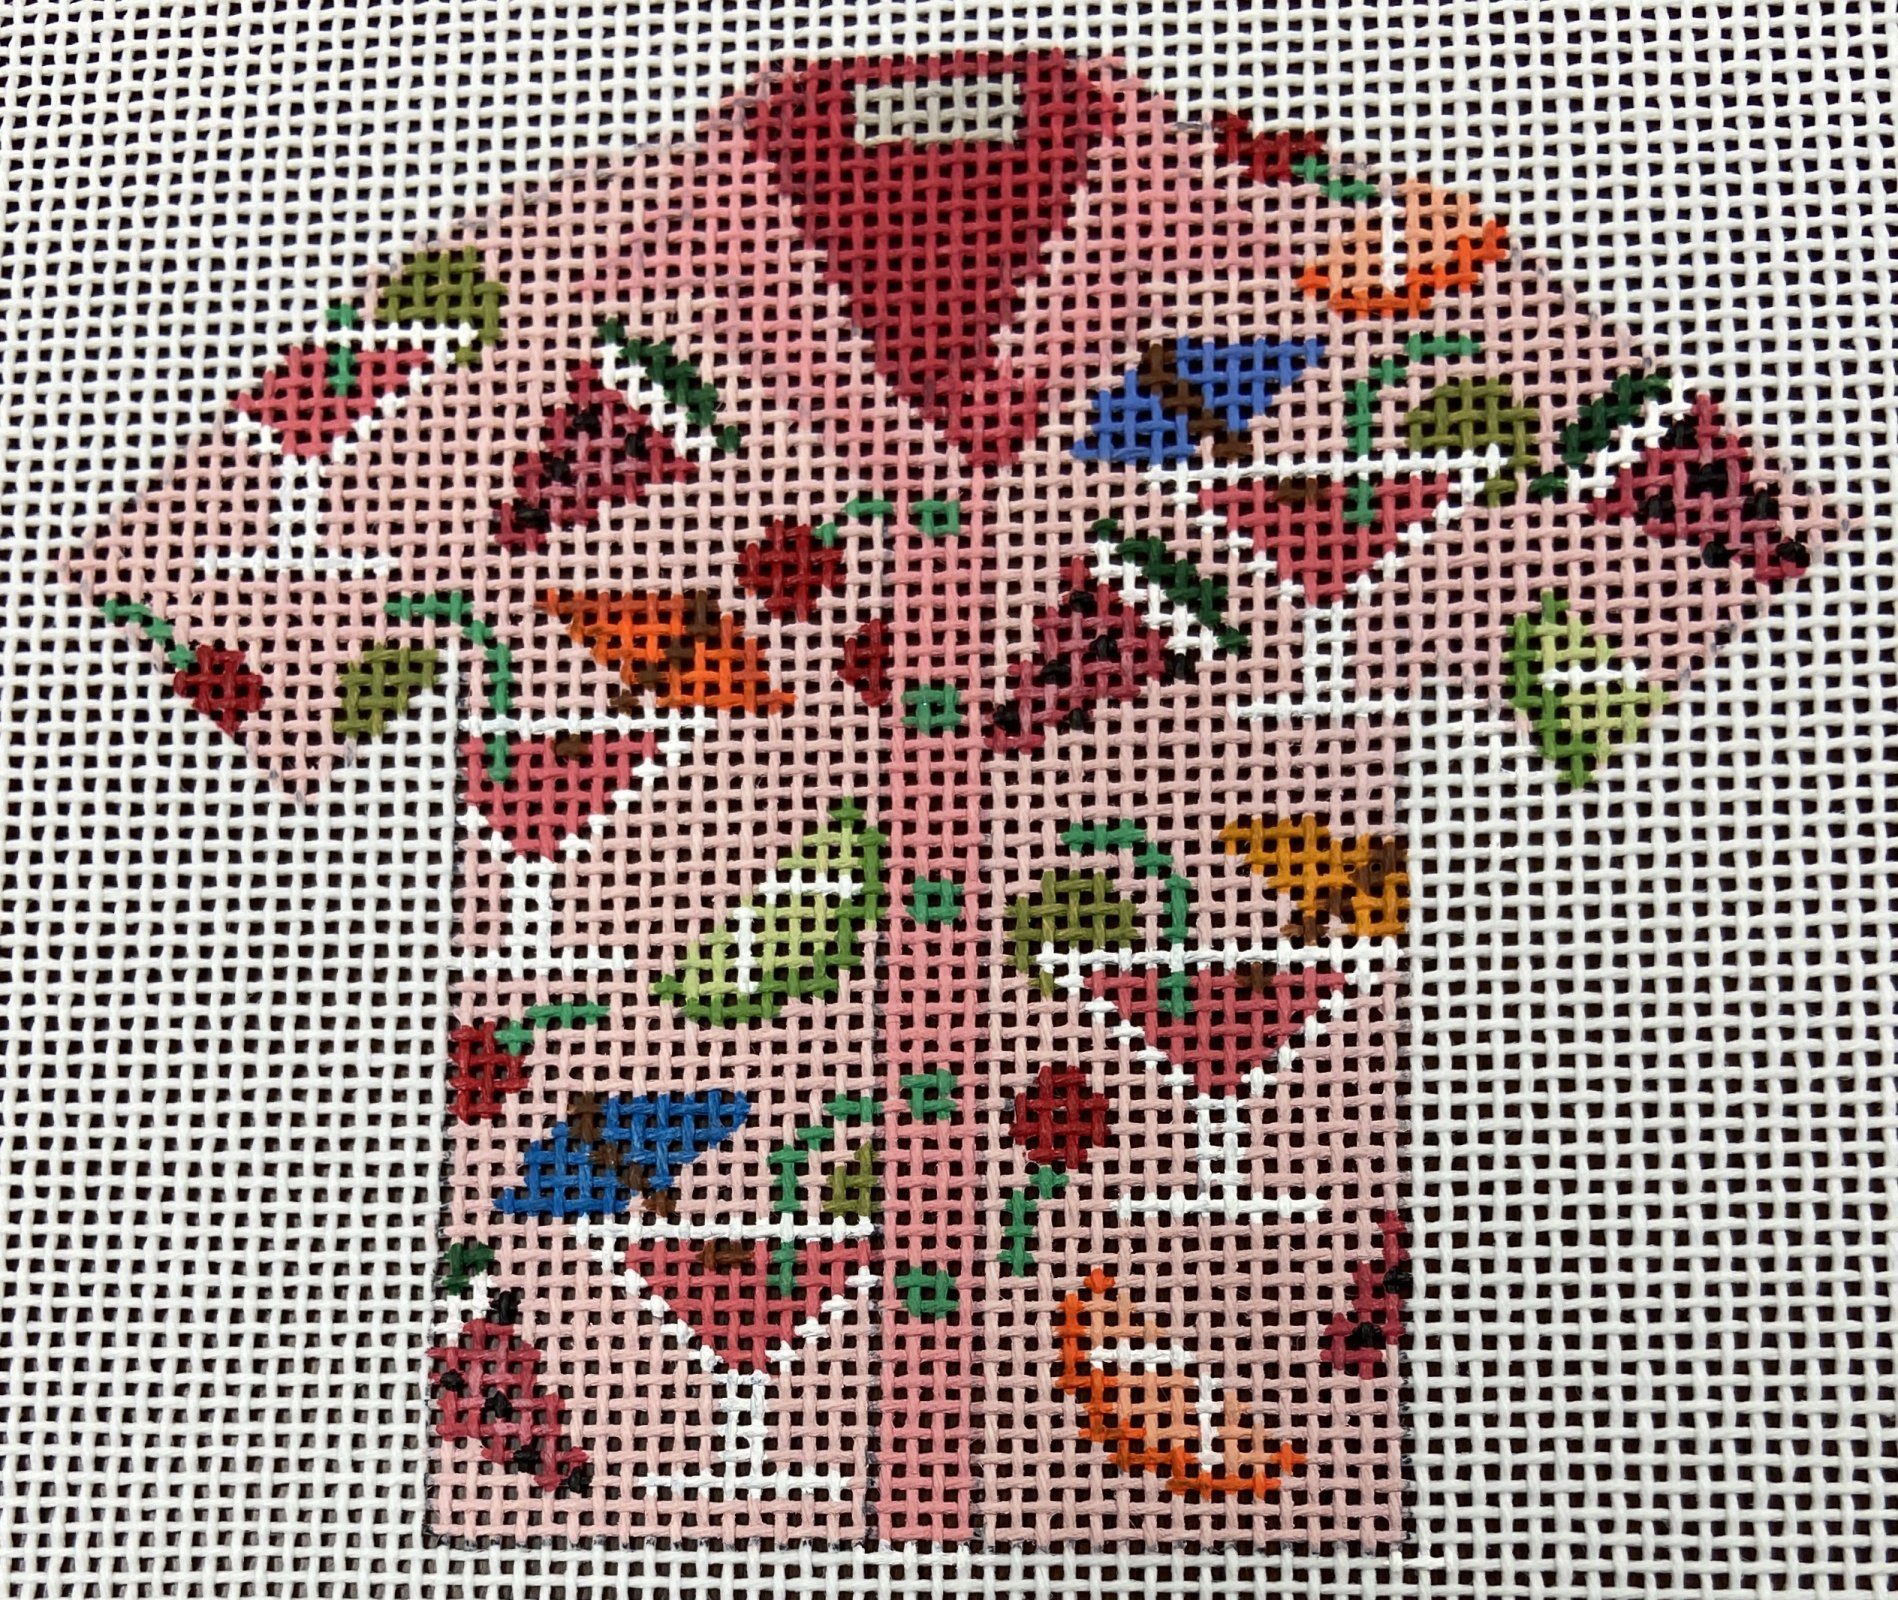 L653 Pink Fruit Drinks Hawaiian Shirt JP Needlepoint